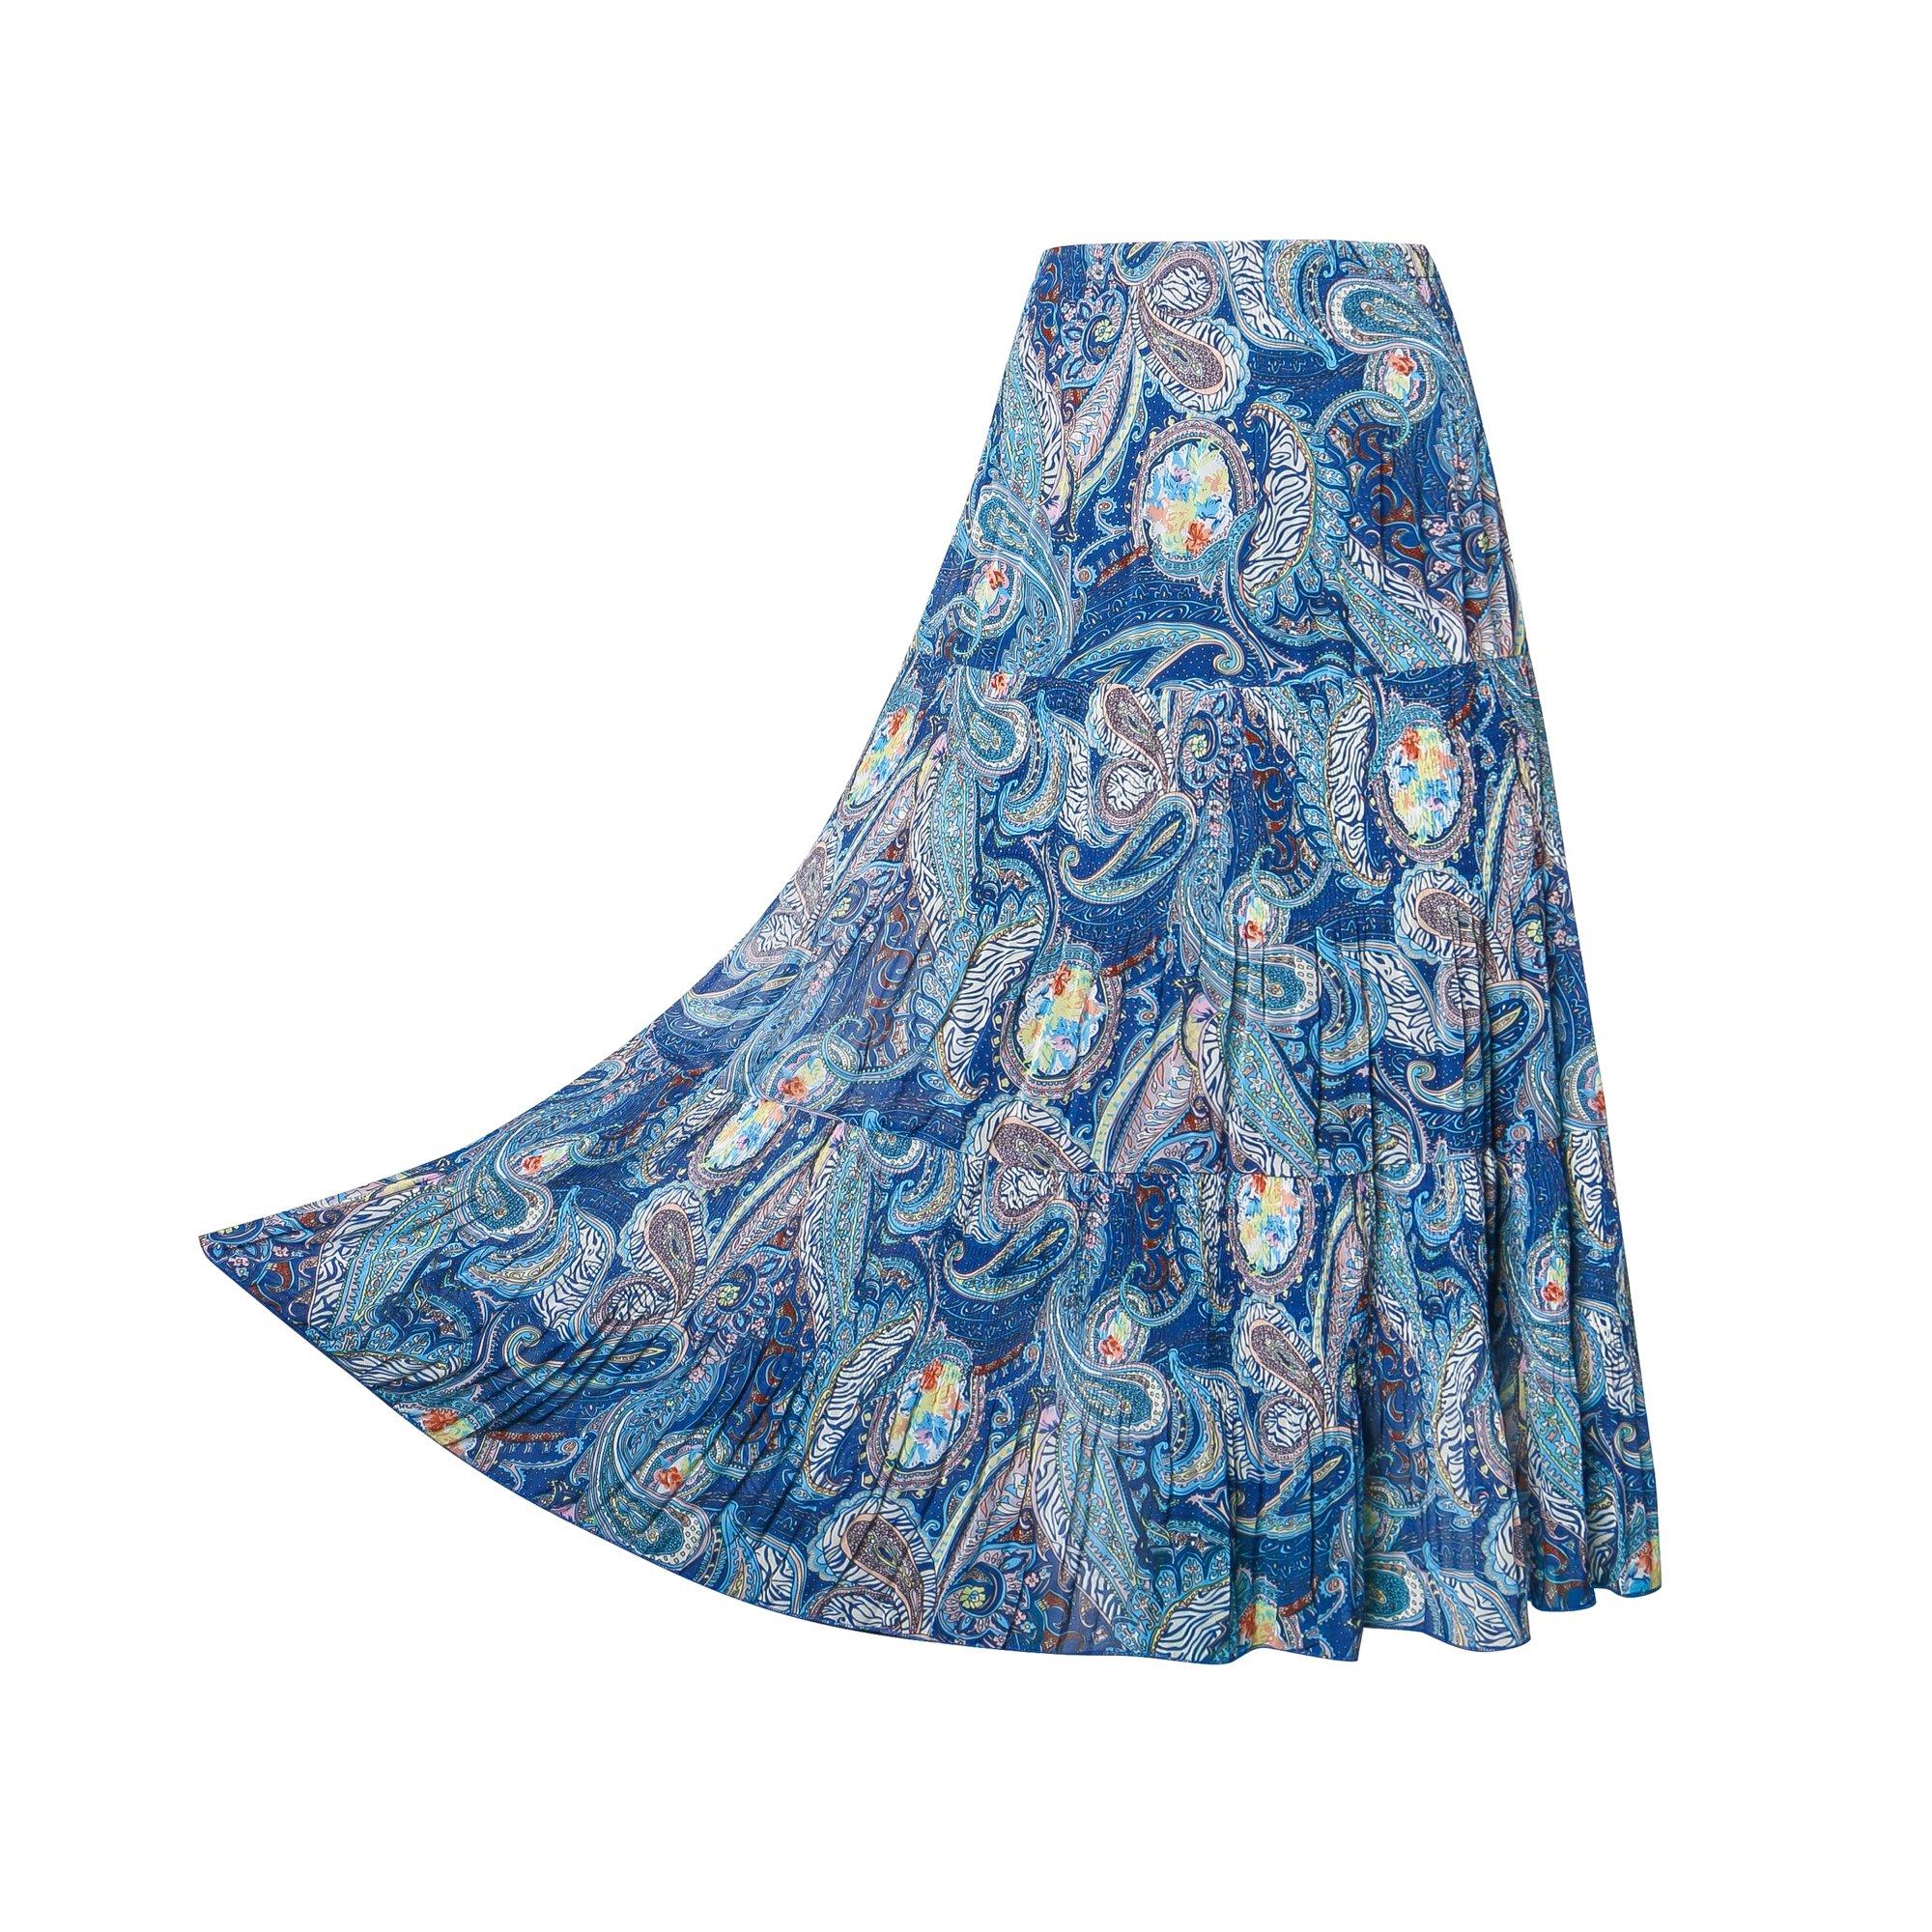 NASHALYLY Women's Print High Elastic Waist Pleated Long Skirt-Chiffon (XL)